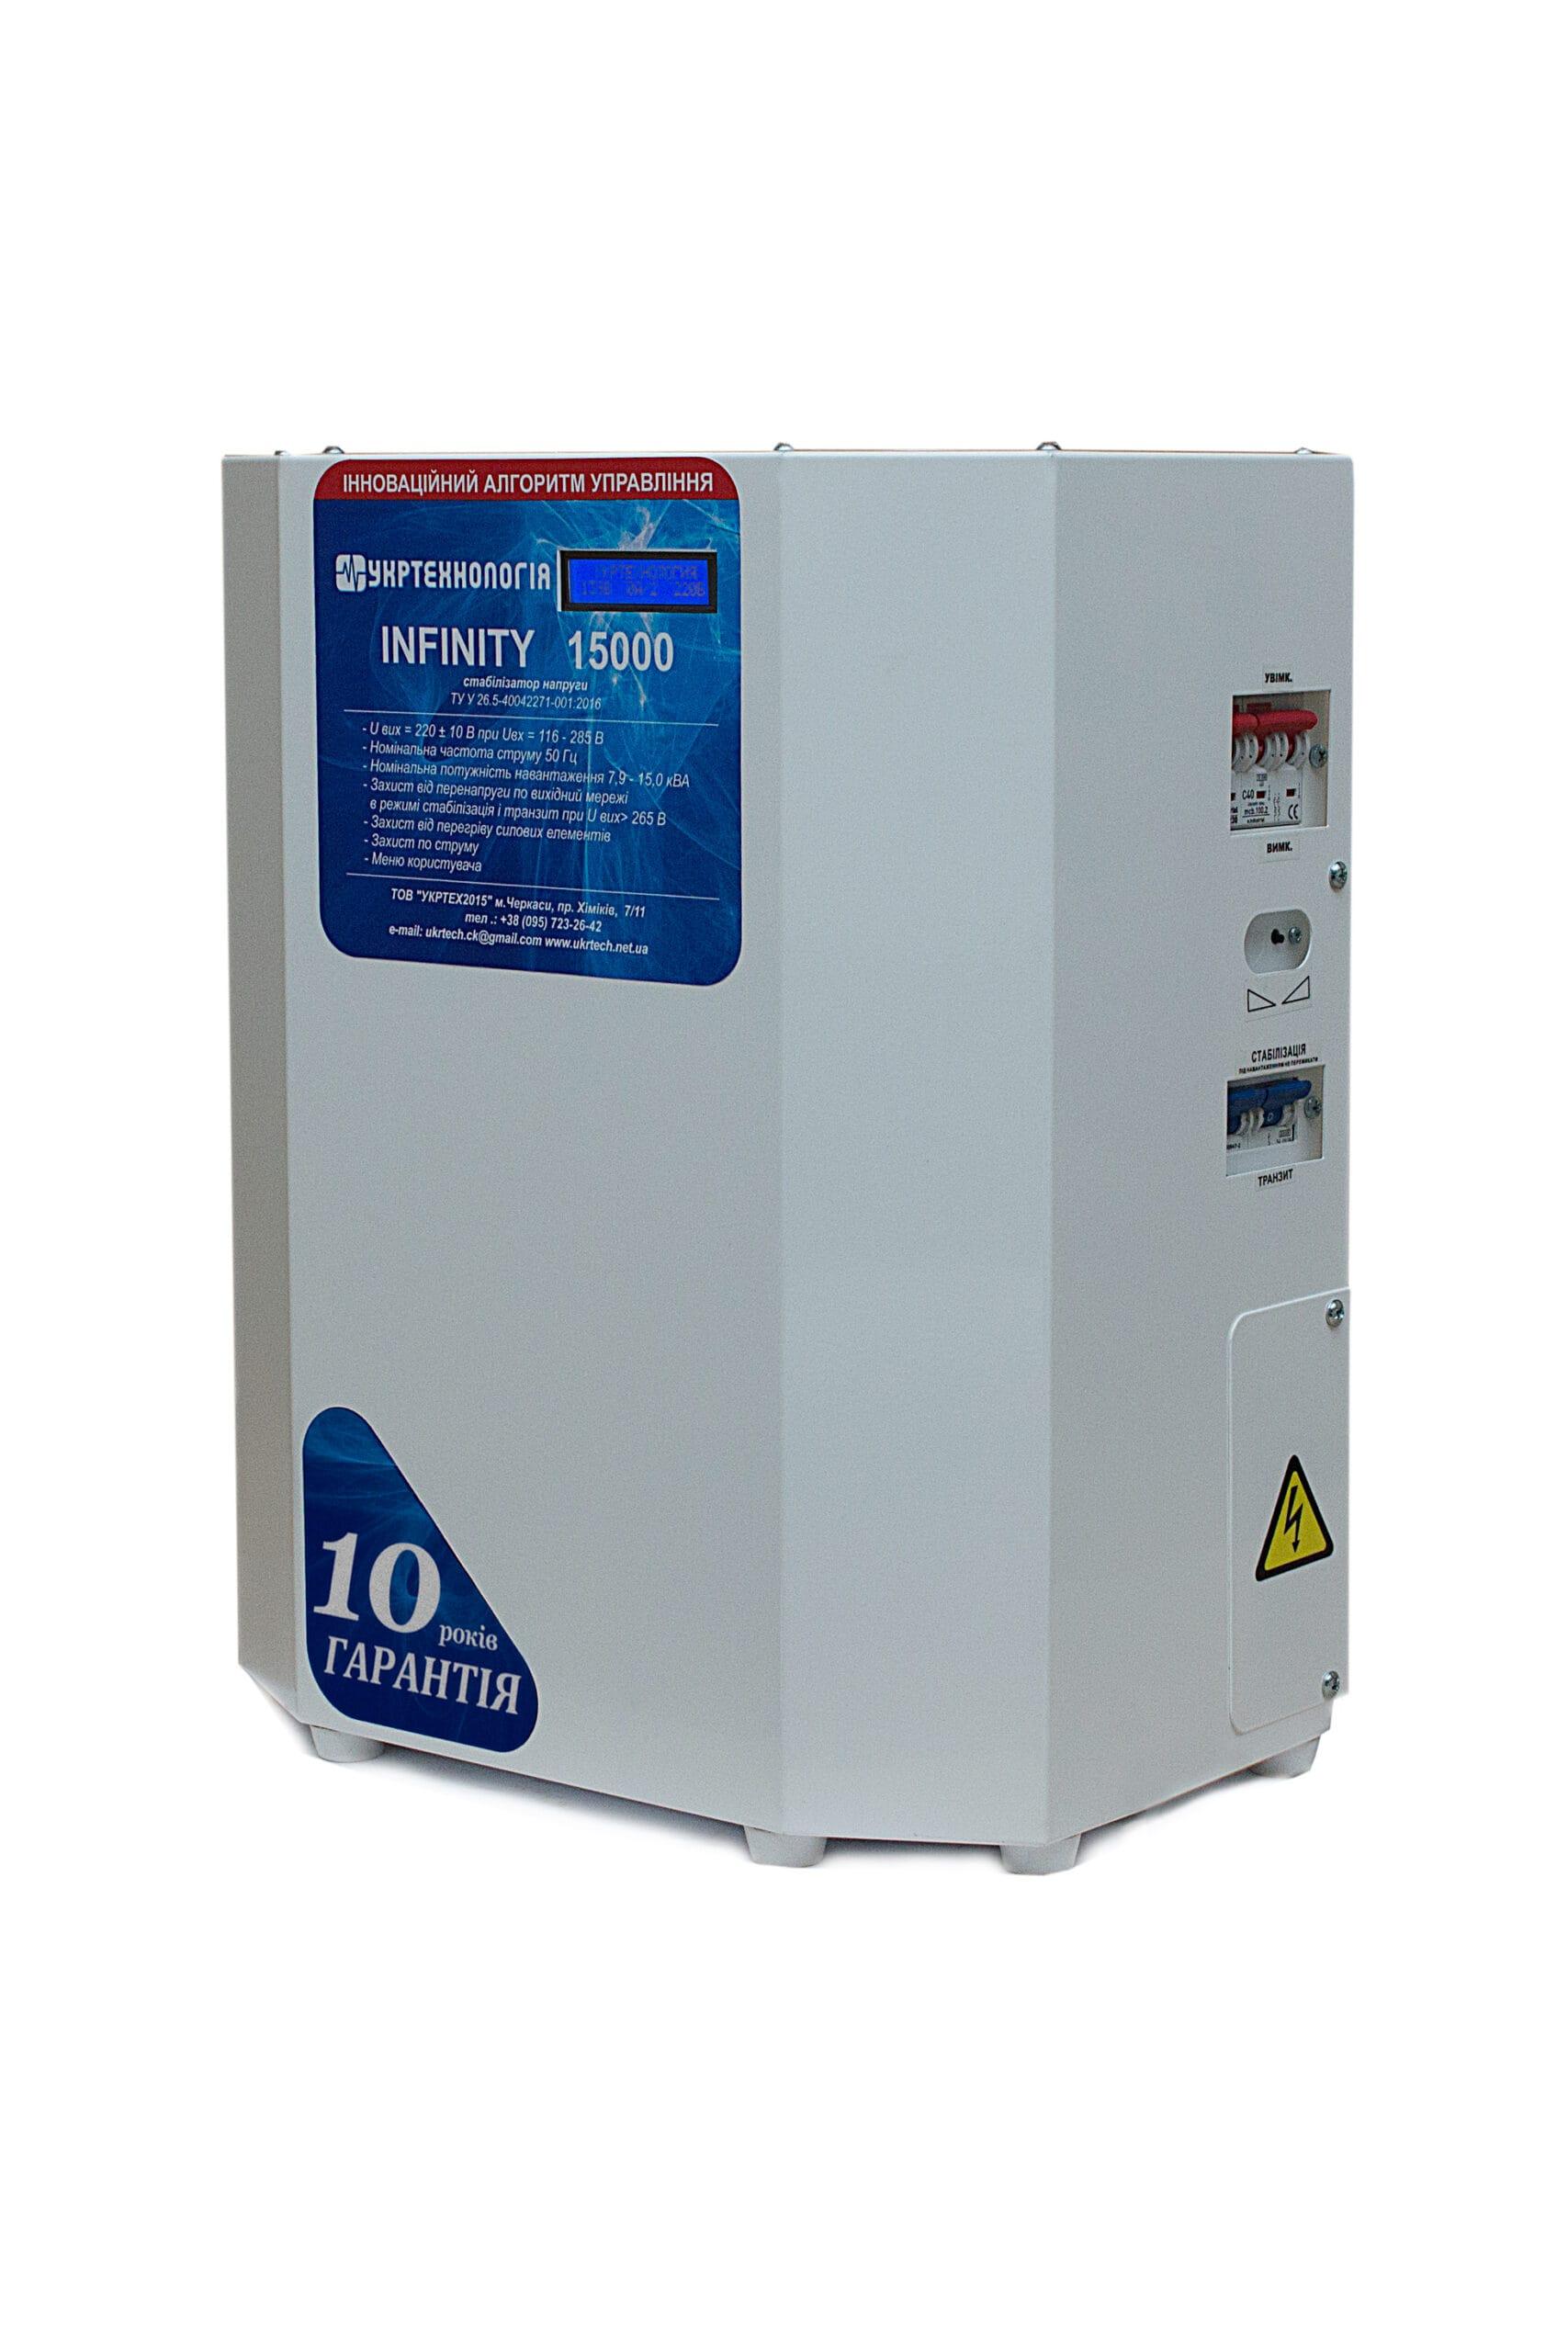 Стабилизаторы напряжения - Стабилизатор напряжения 15 кВт INFINITY 000001414 - Фото 2